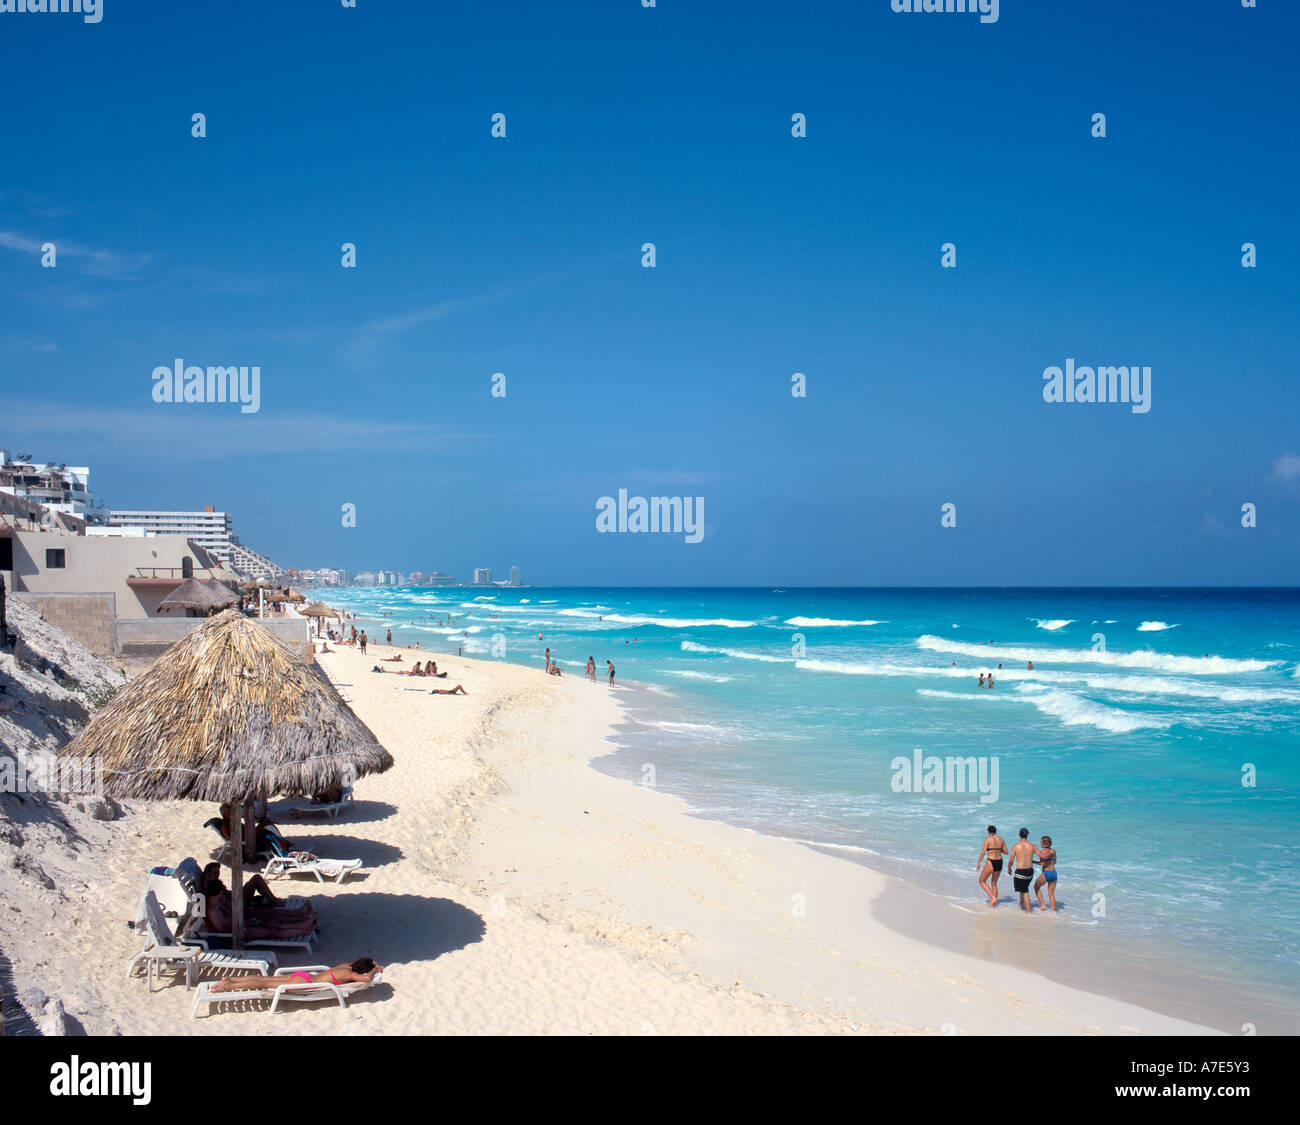 Beach near Hotel Tucancun, Cancun, Quintana Roo, Yucatan Peninsula, Mexico - Stock Image